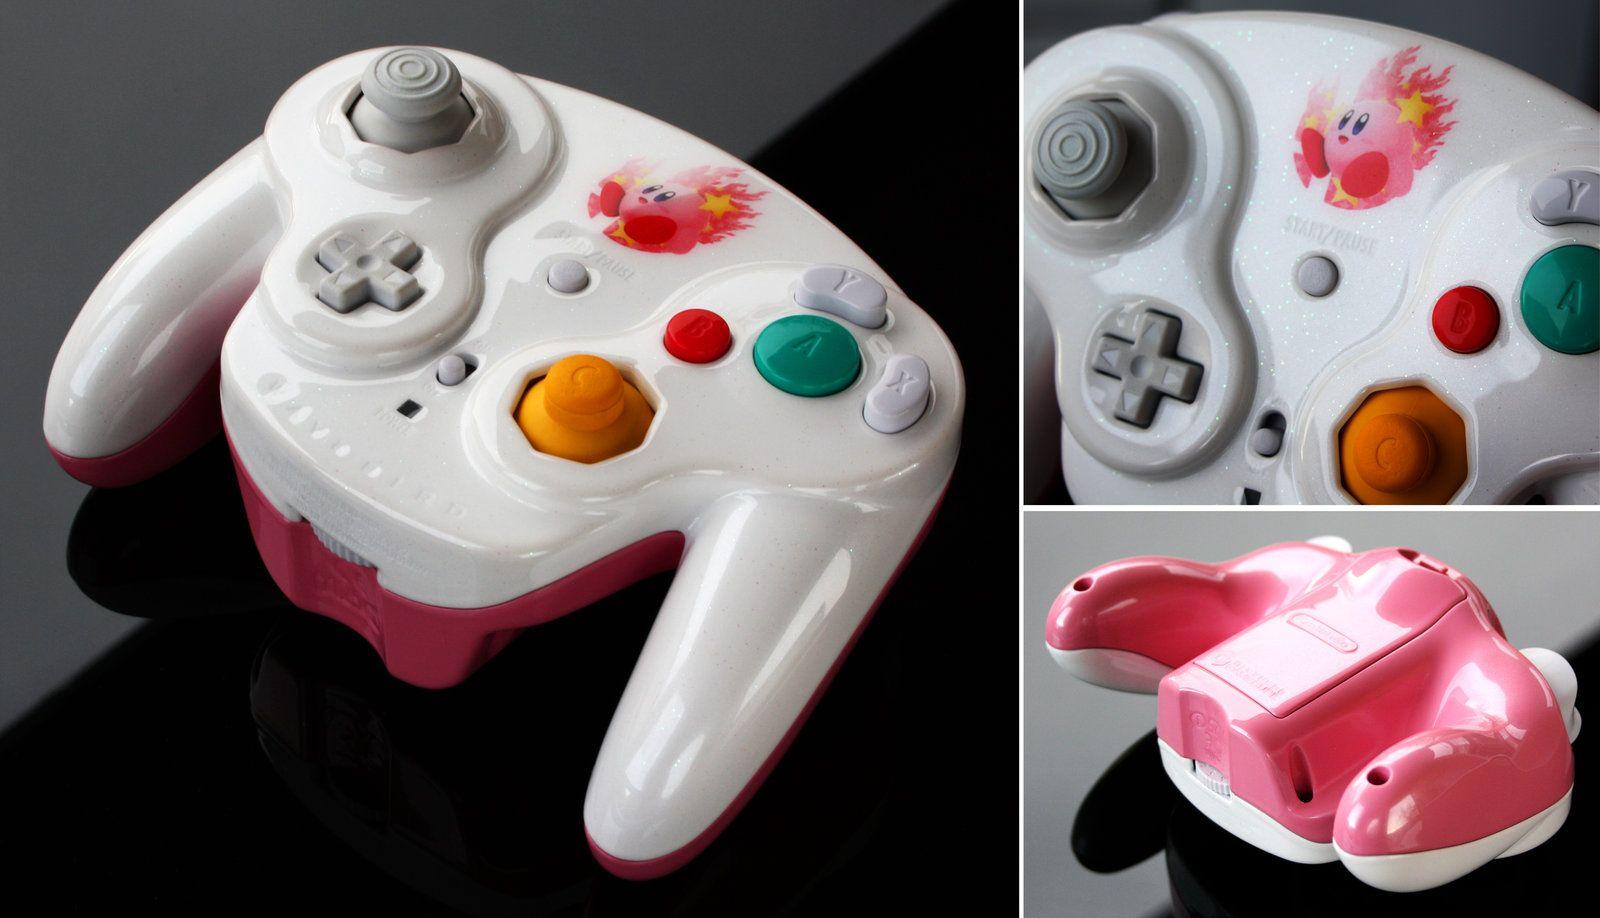 Custom Kirby Smash Bros Gamecube Controller With Pearls And Iridesc By Zoki64 Deviantart Com On Deviantart Gamecube Controller Kirby Custom Consoles